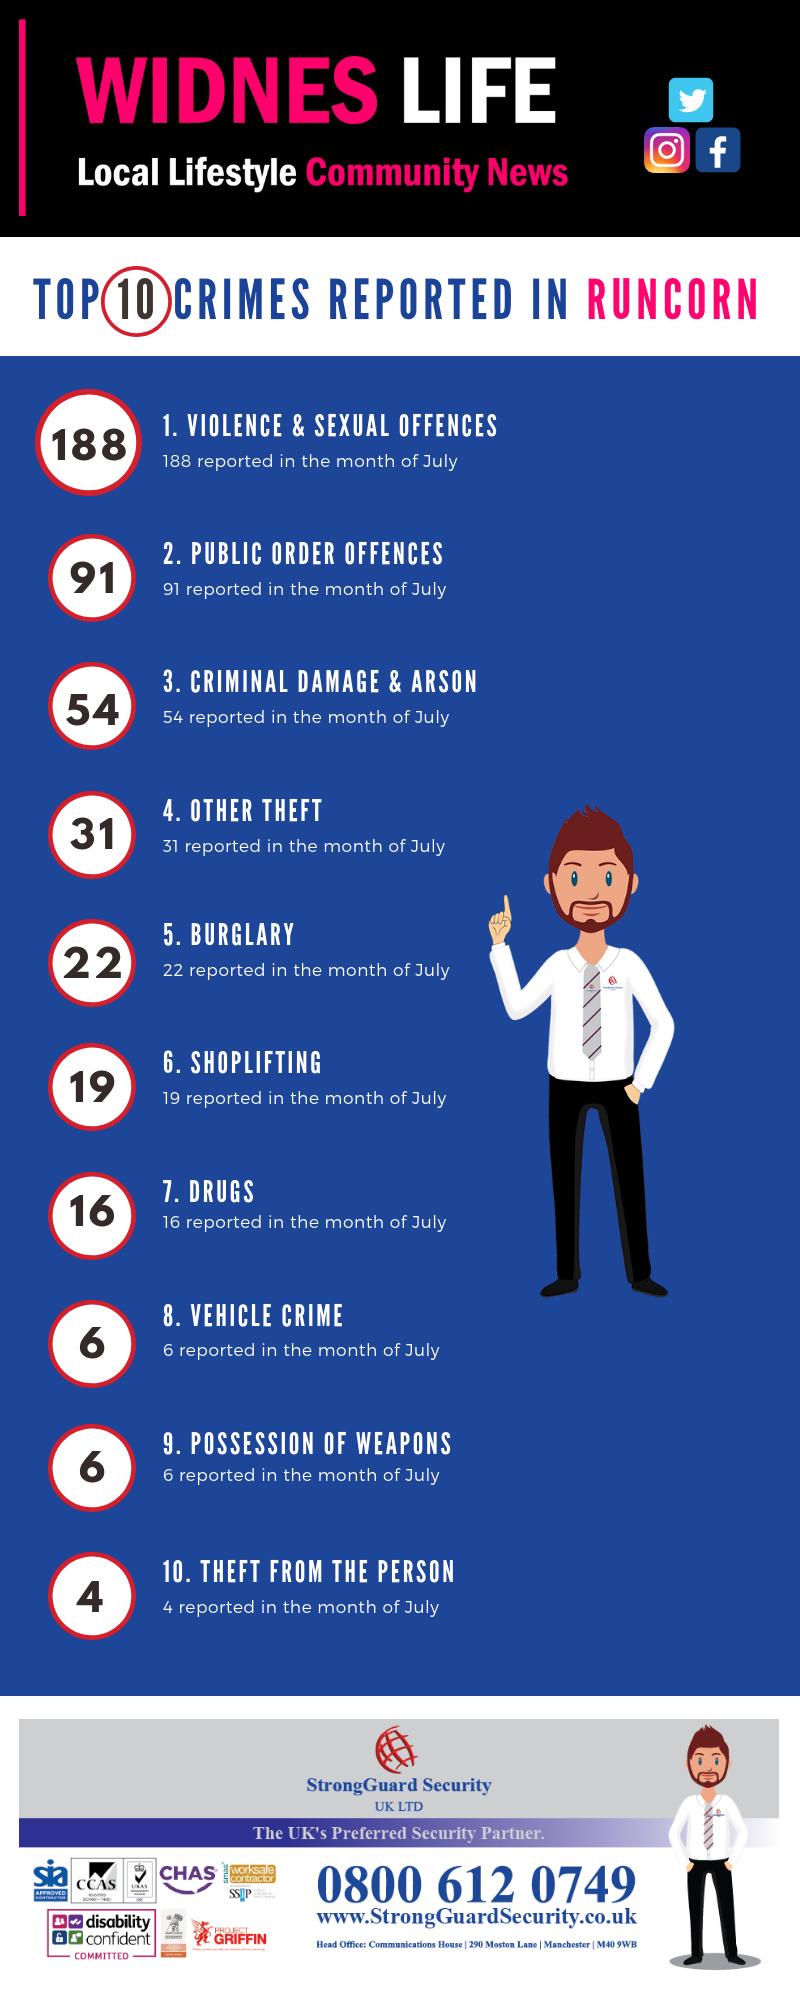 10 MOST REPORTED CRIMES IN RUNCORN - JULY 2018